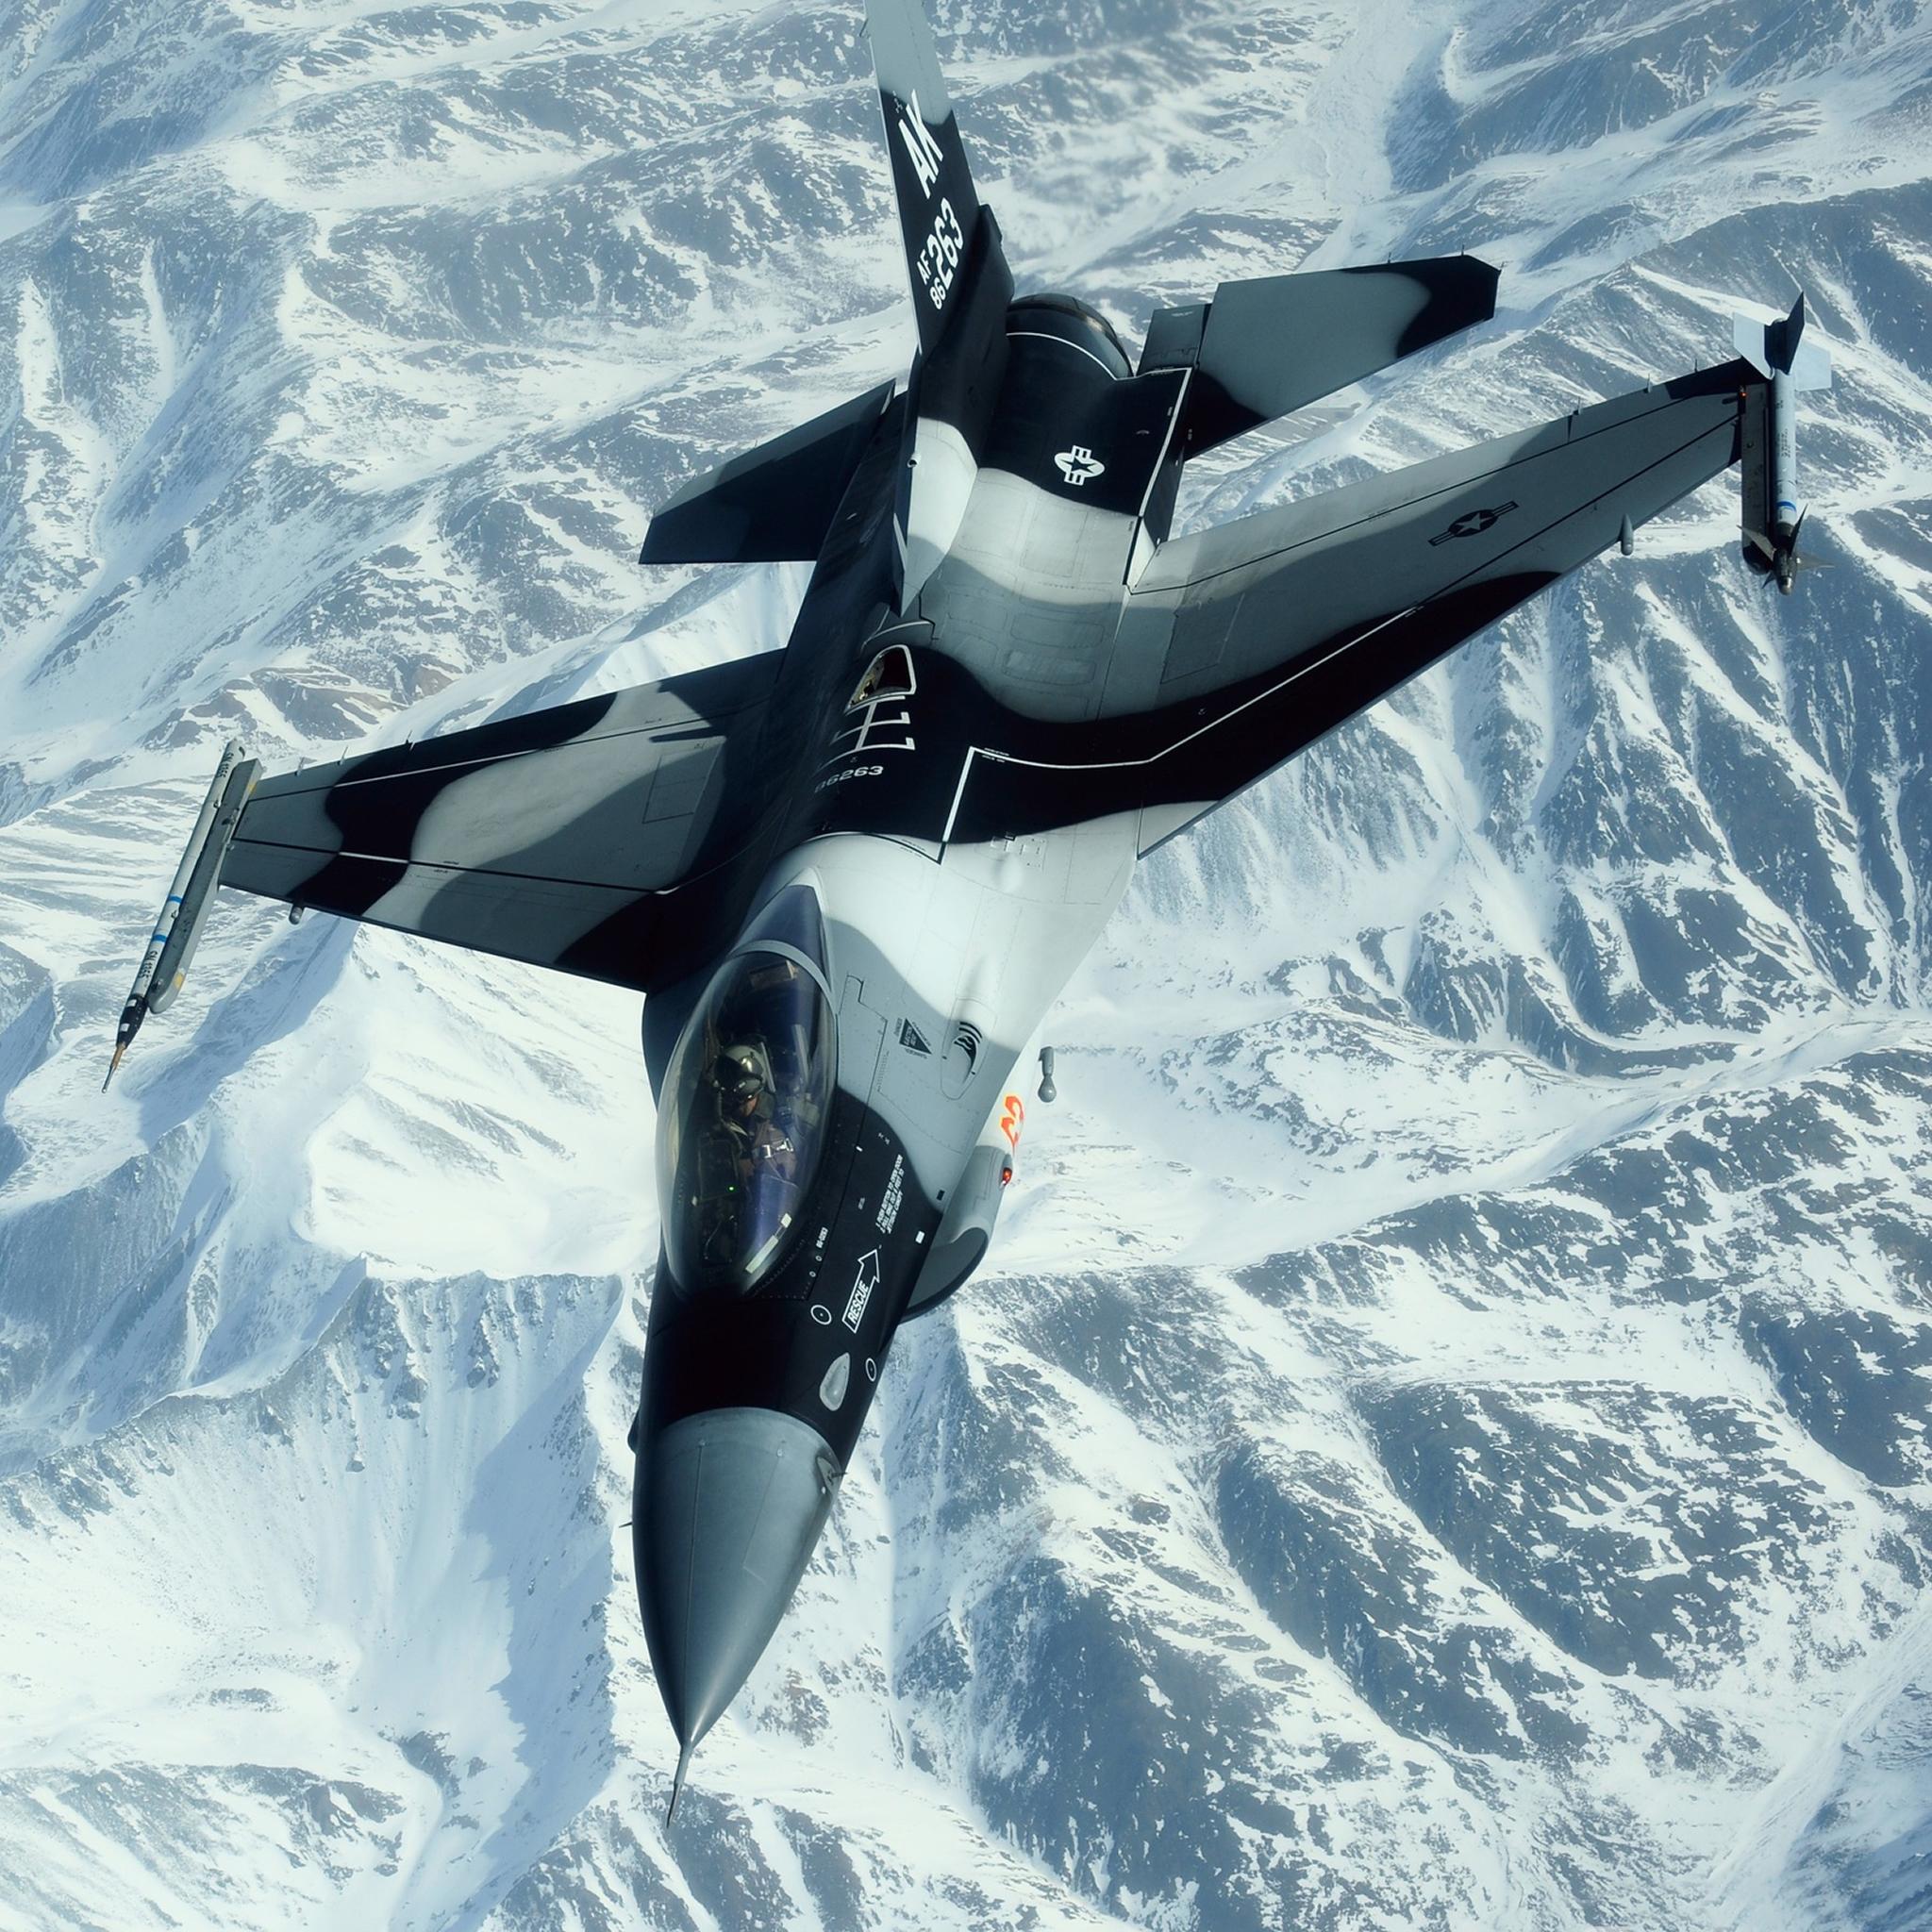 Military-Aircraft-3Wallpapers-iPad-Retina